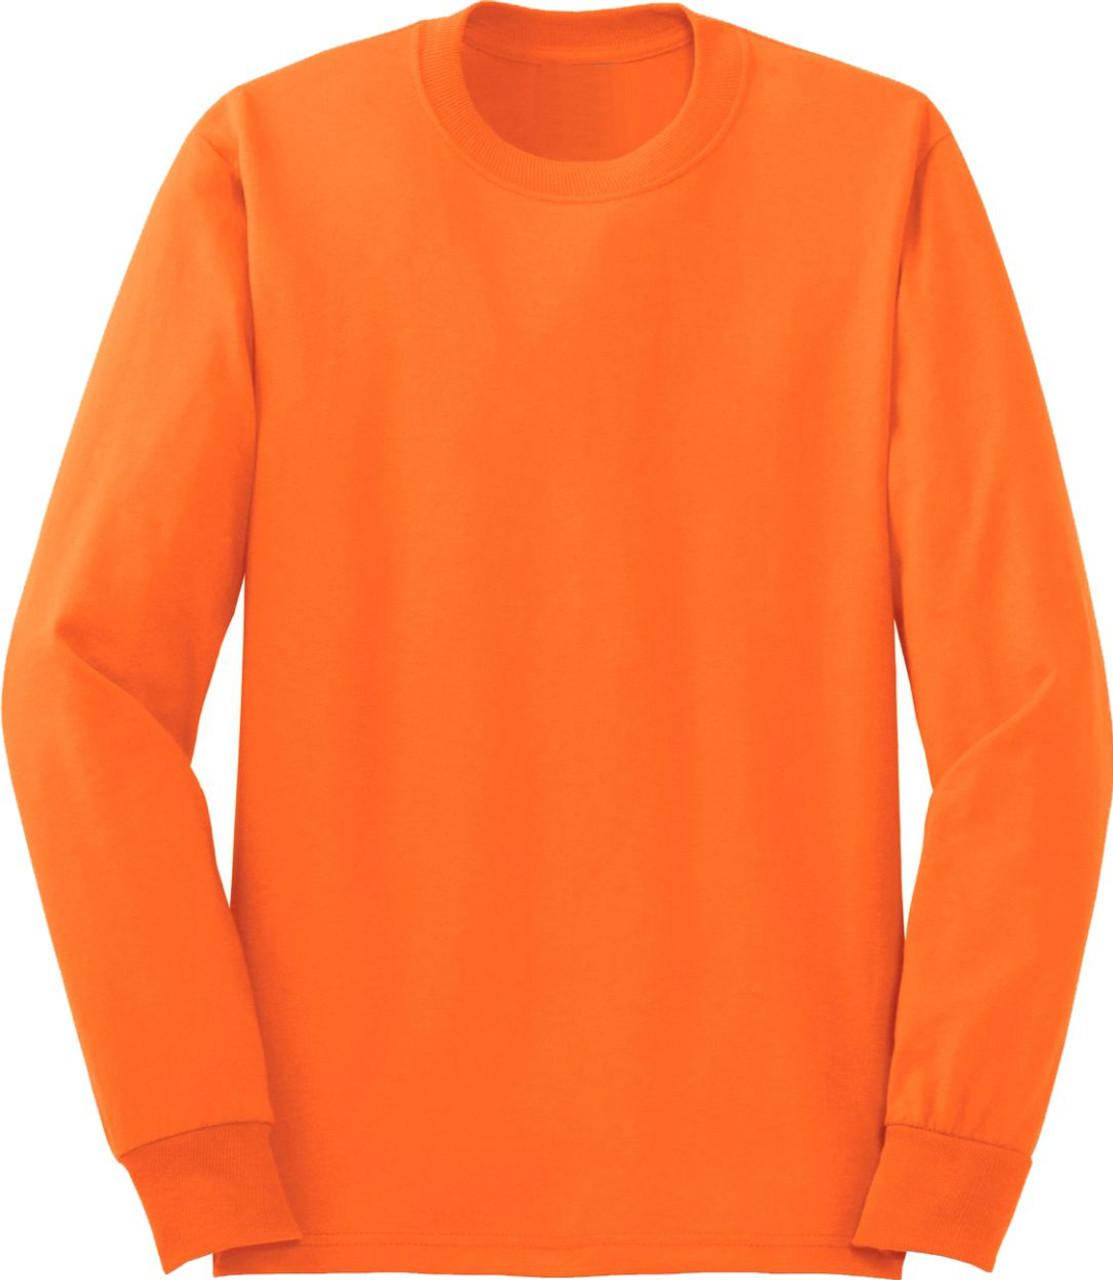 Safety Orange Long Sleeve TShirt | Hi Vis Work Shirt